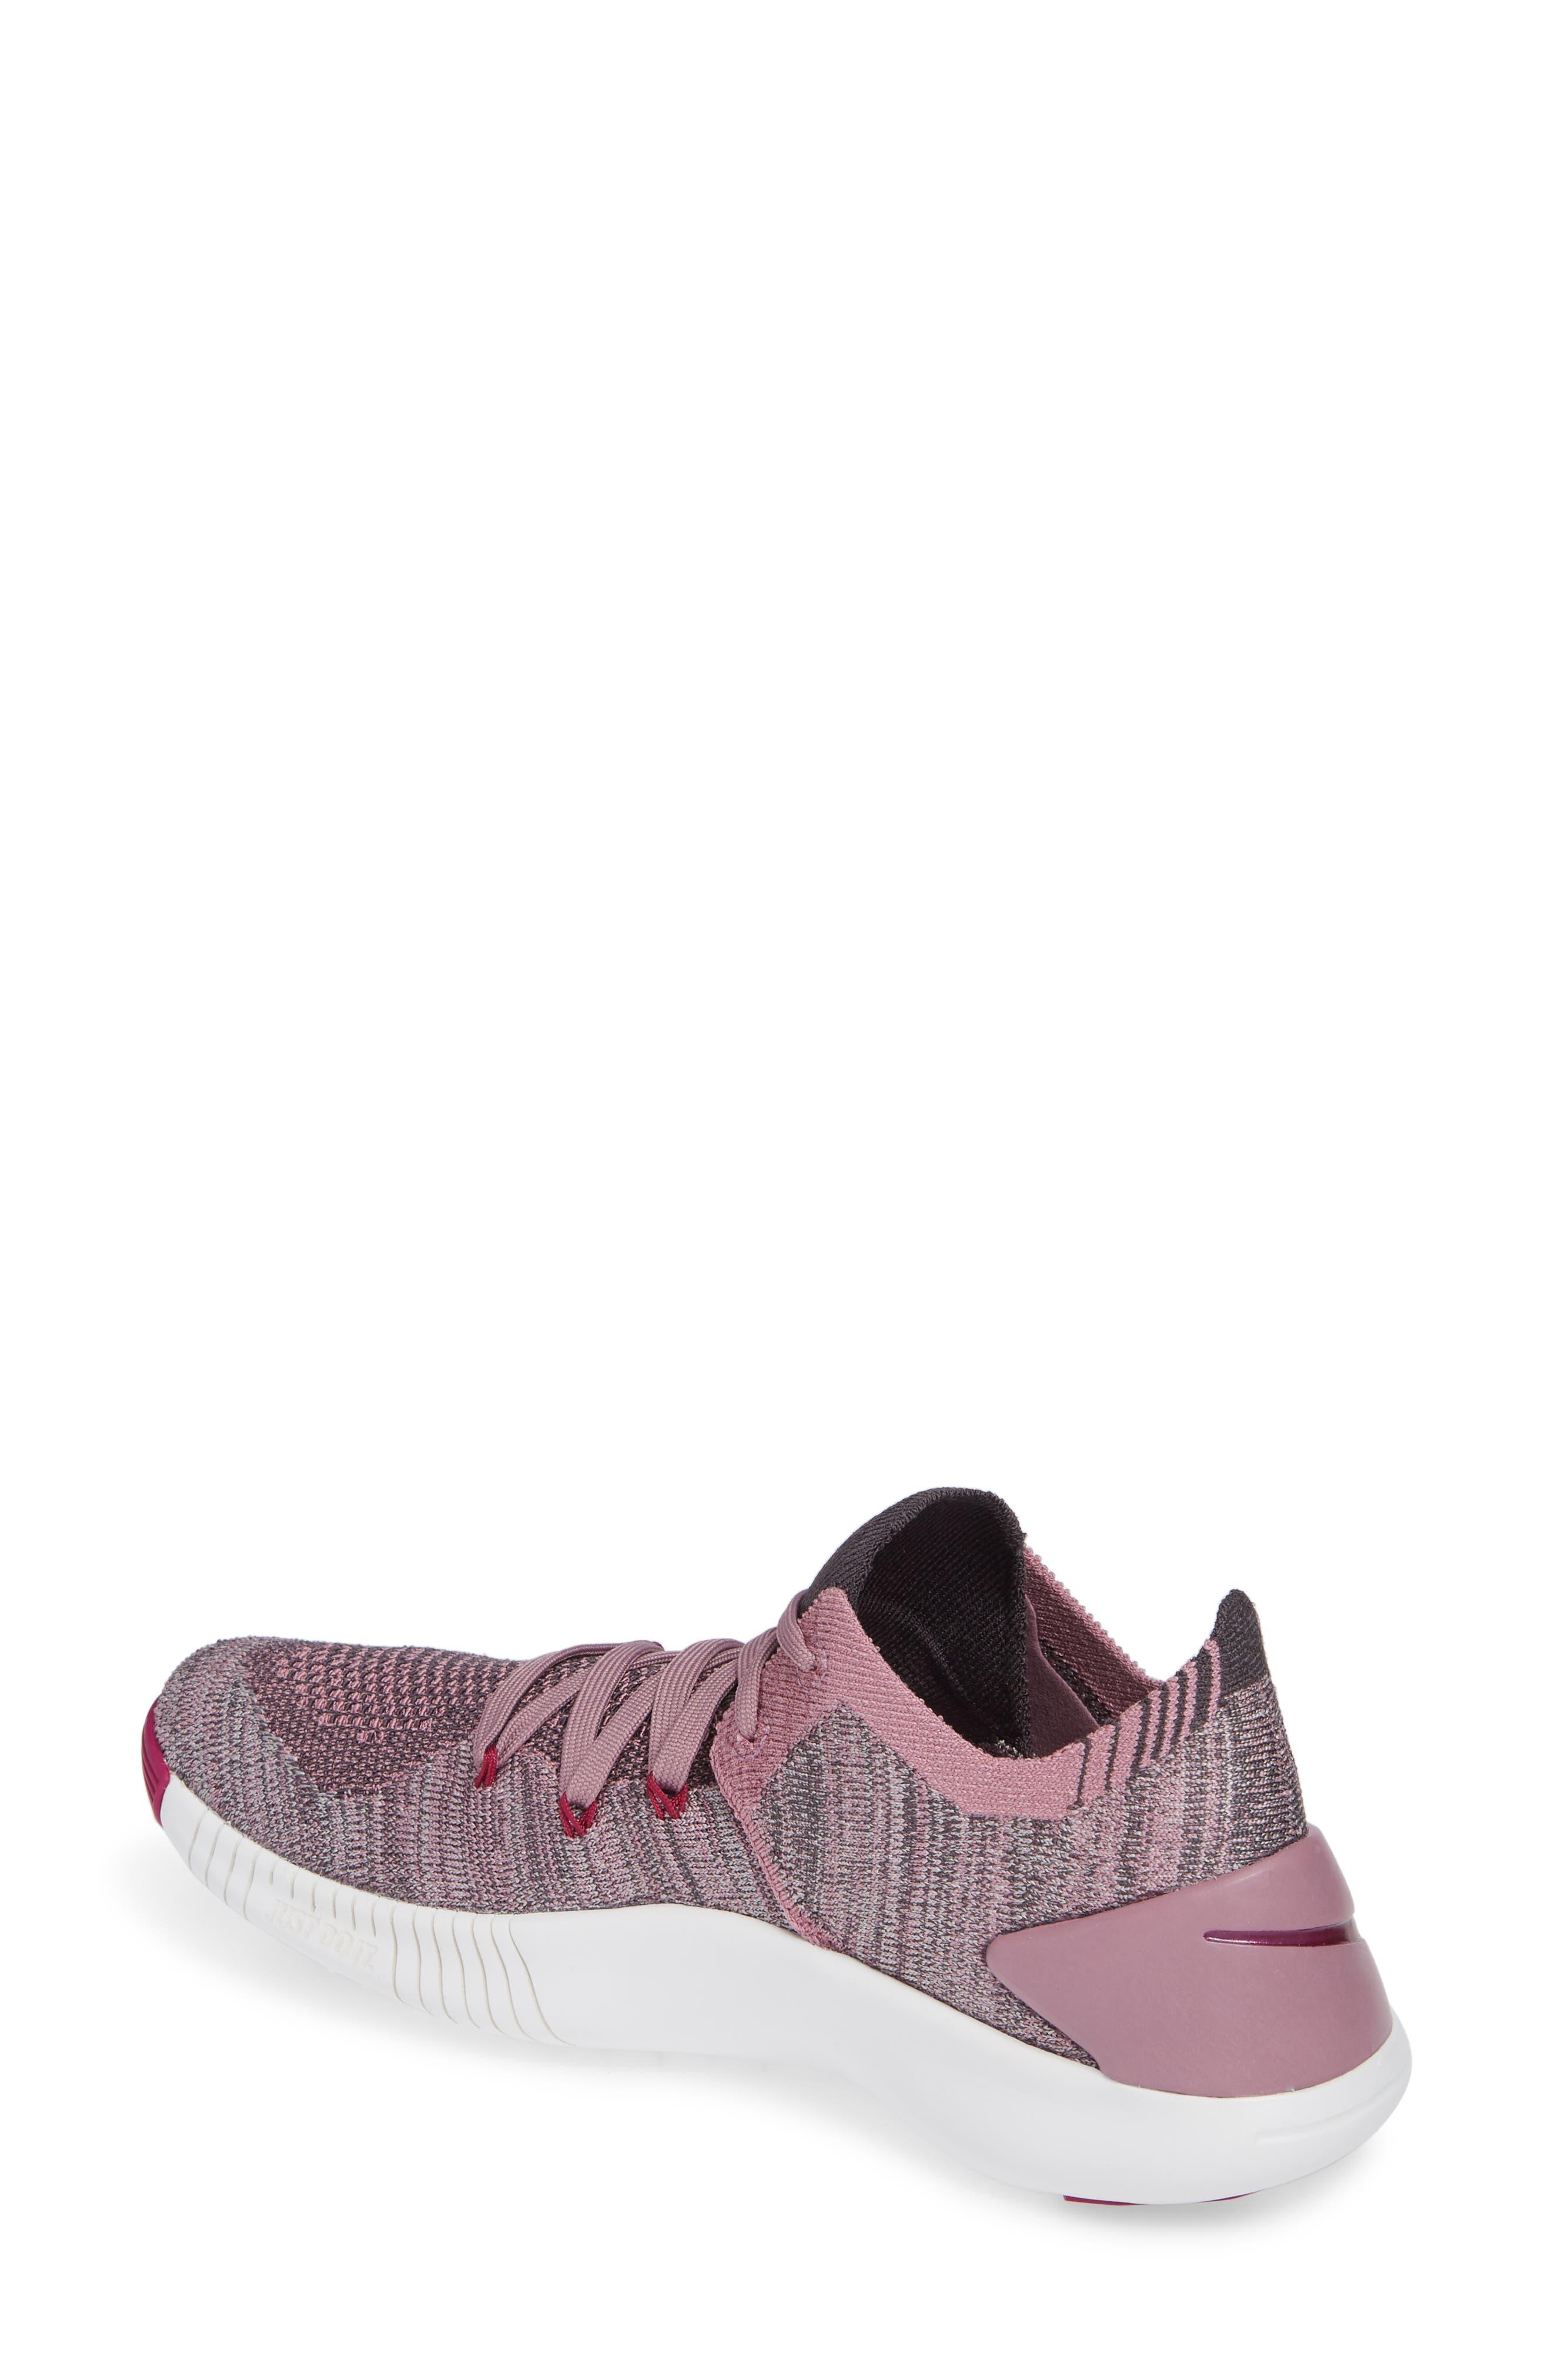 10fab4b2b8b9d Nike Free Run